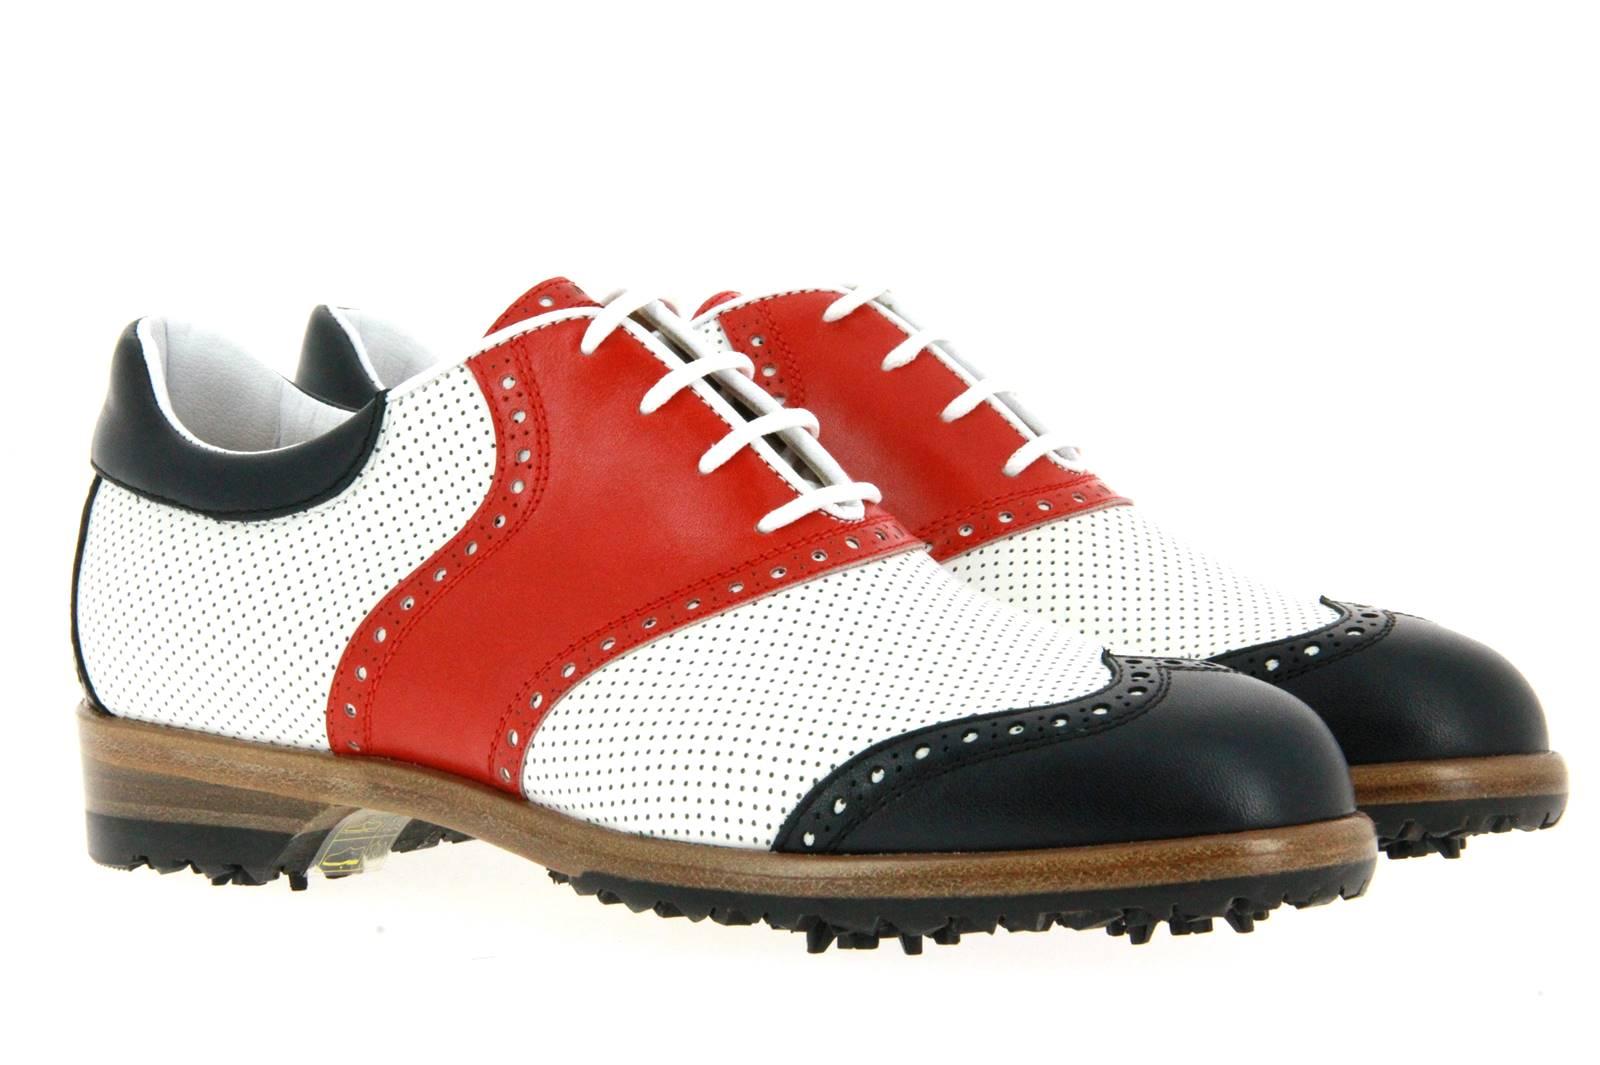 Tee Golf Shoes Damen- Golfschuh SUSY PERFORATO BLU BIANCO ROSSO (36½)